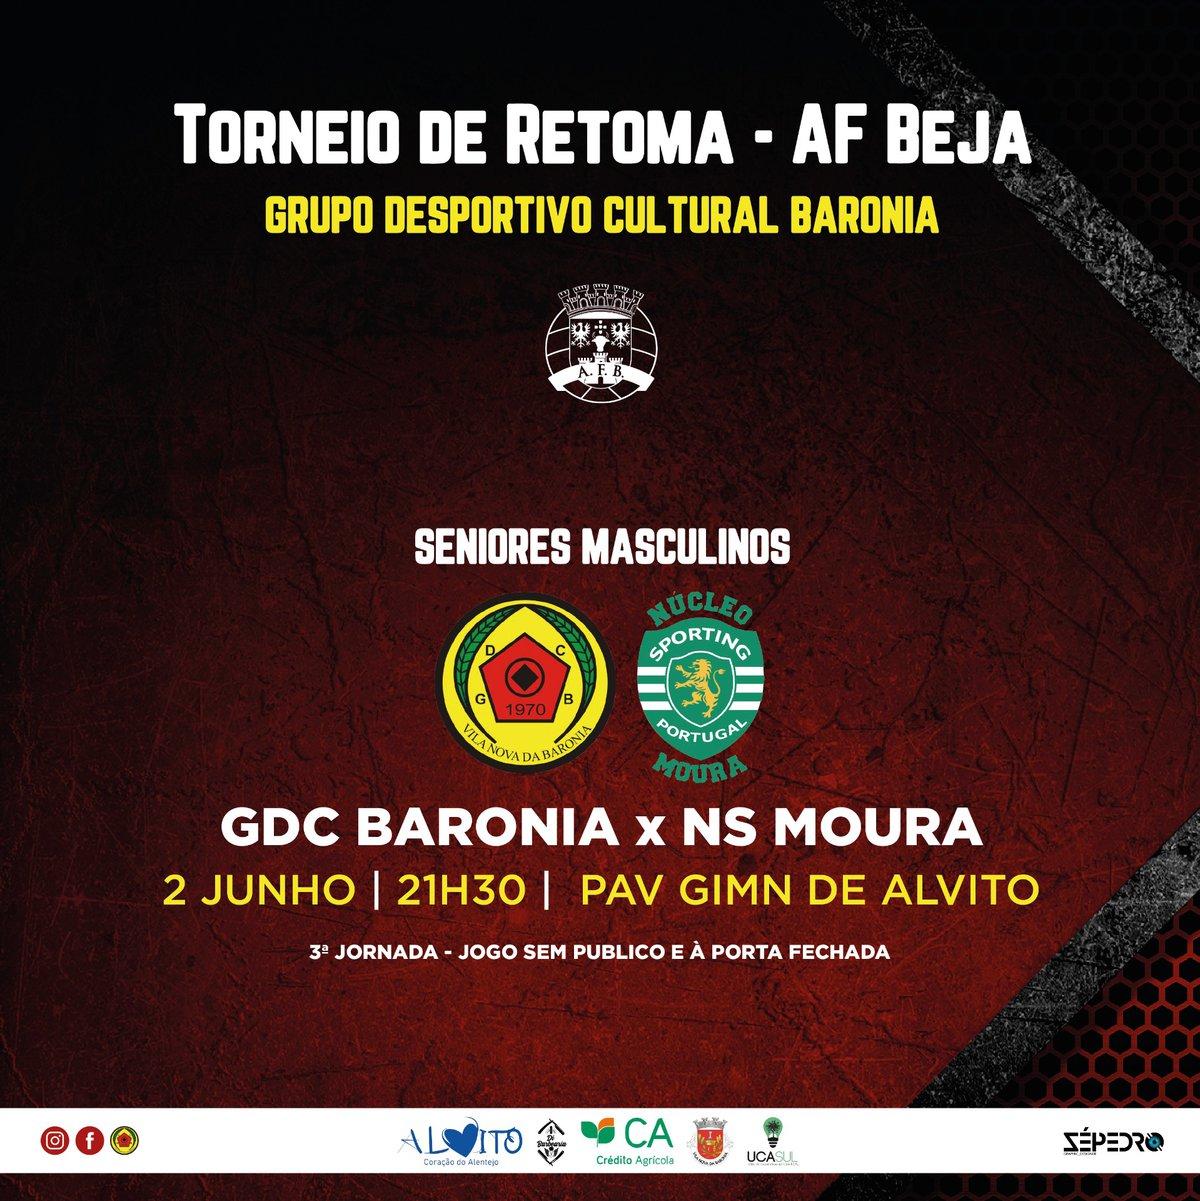 Jogo - GDC Baronia x NS Moura